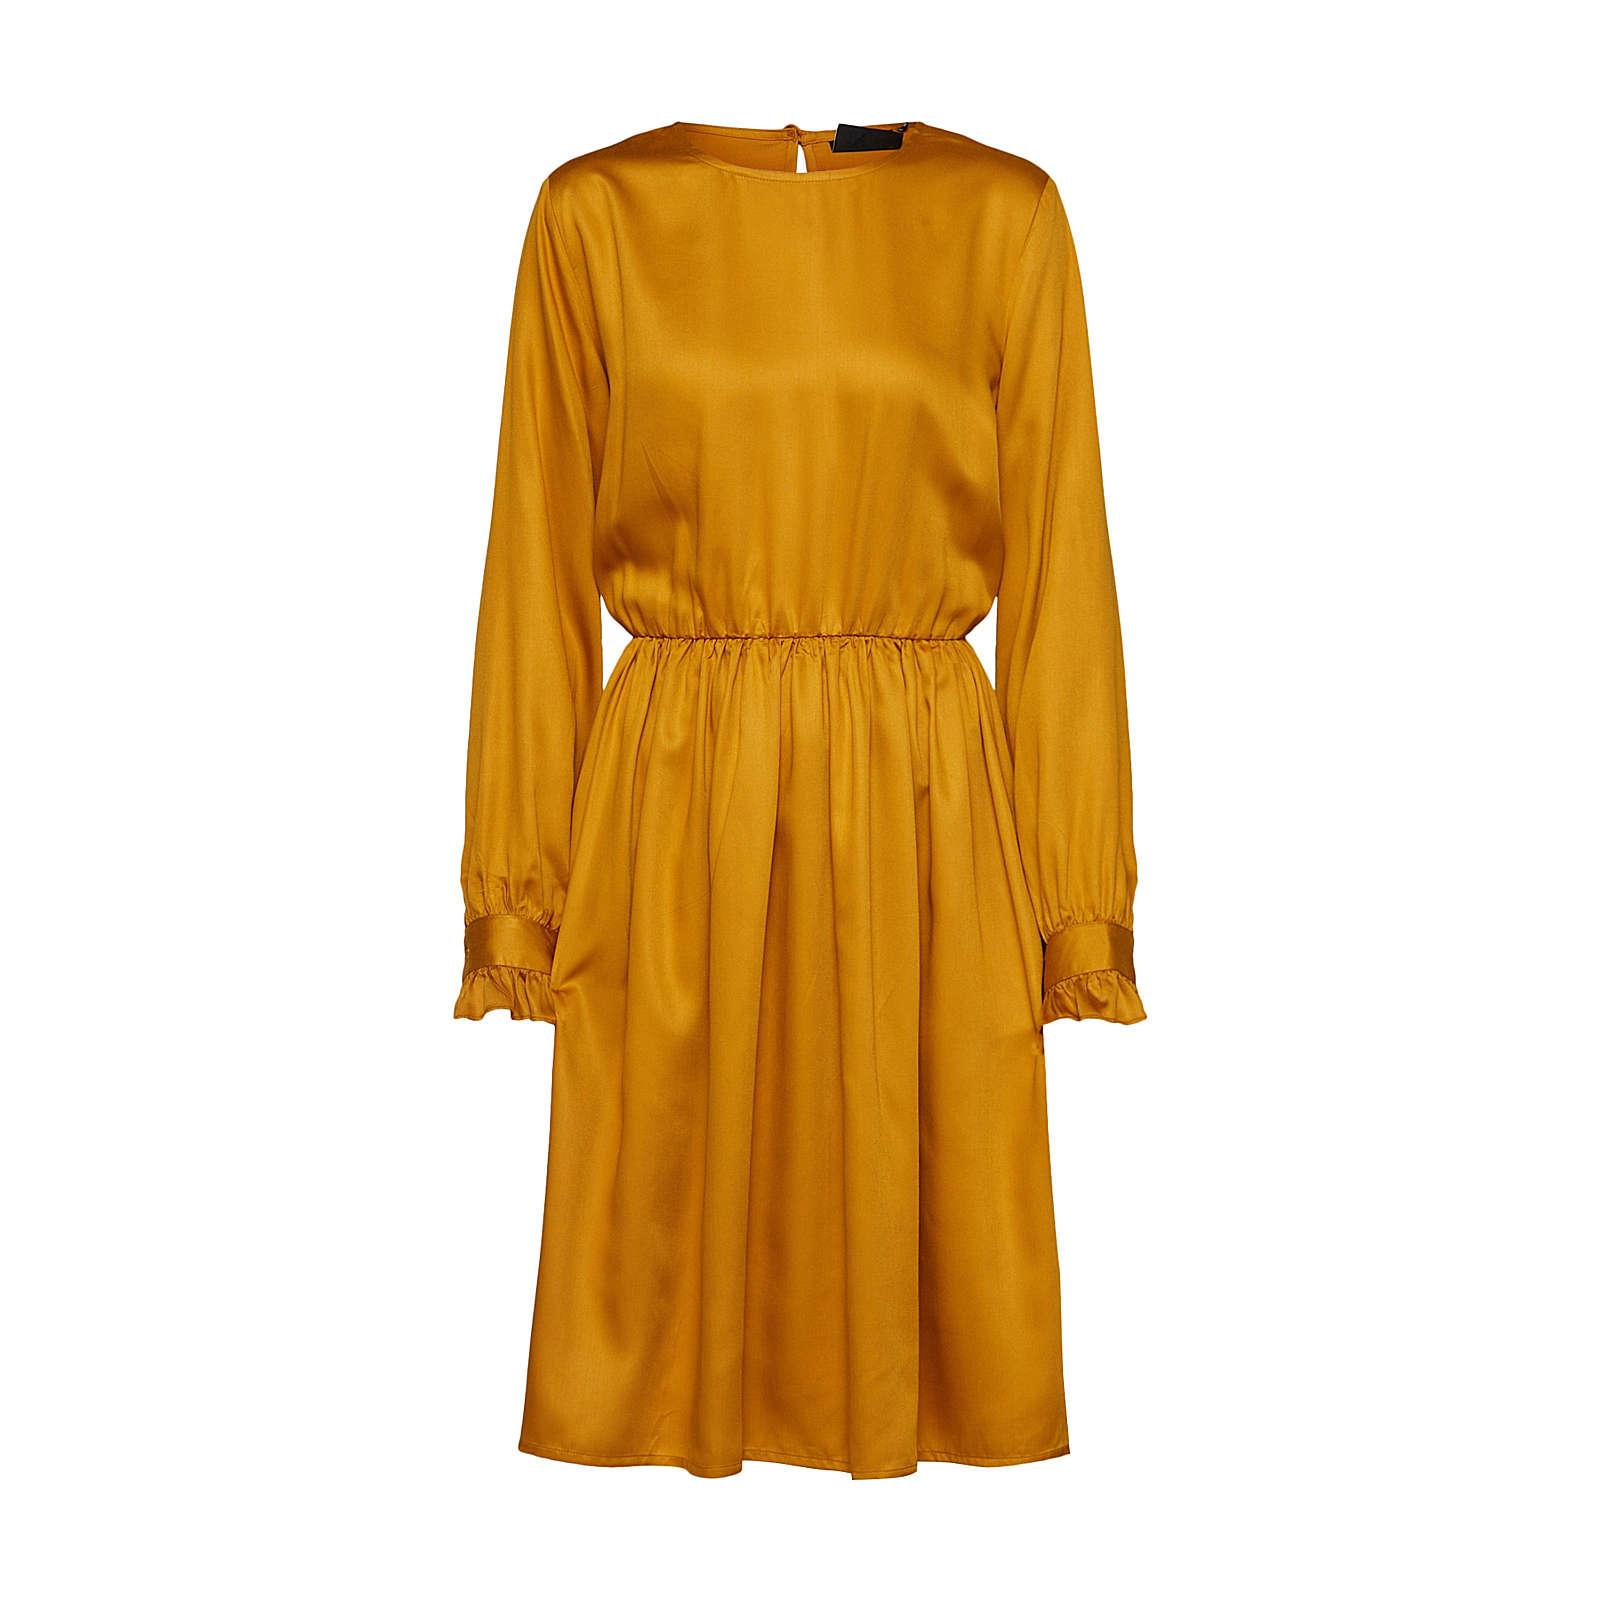 OBJECT Blusenkleid Blusenkleider gold Damen Gr. 38